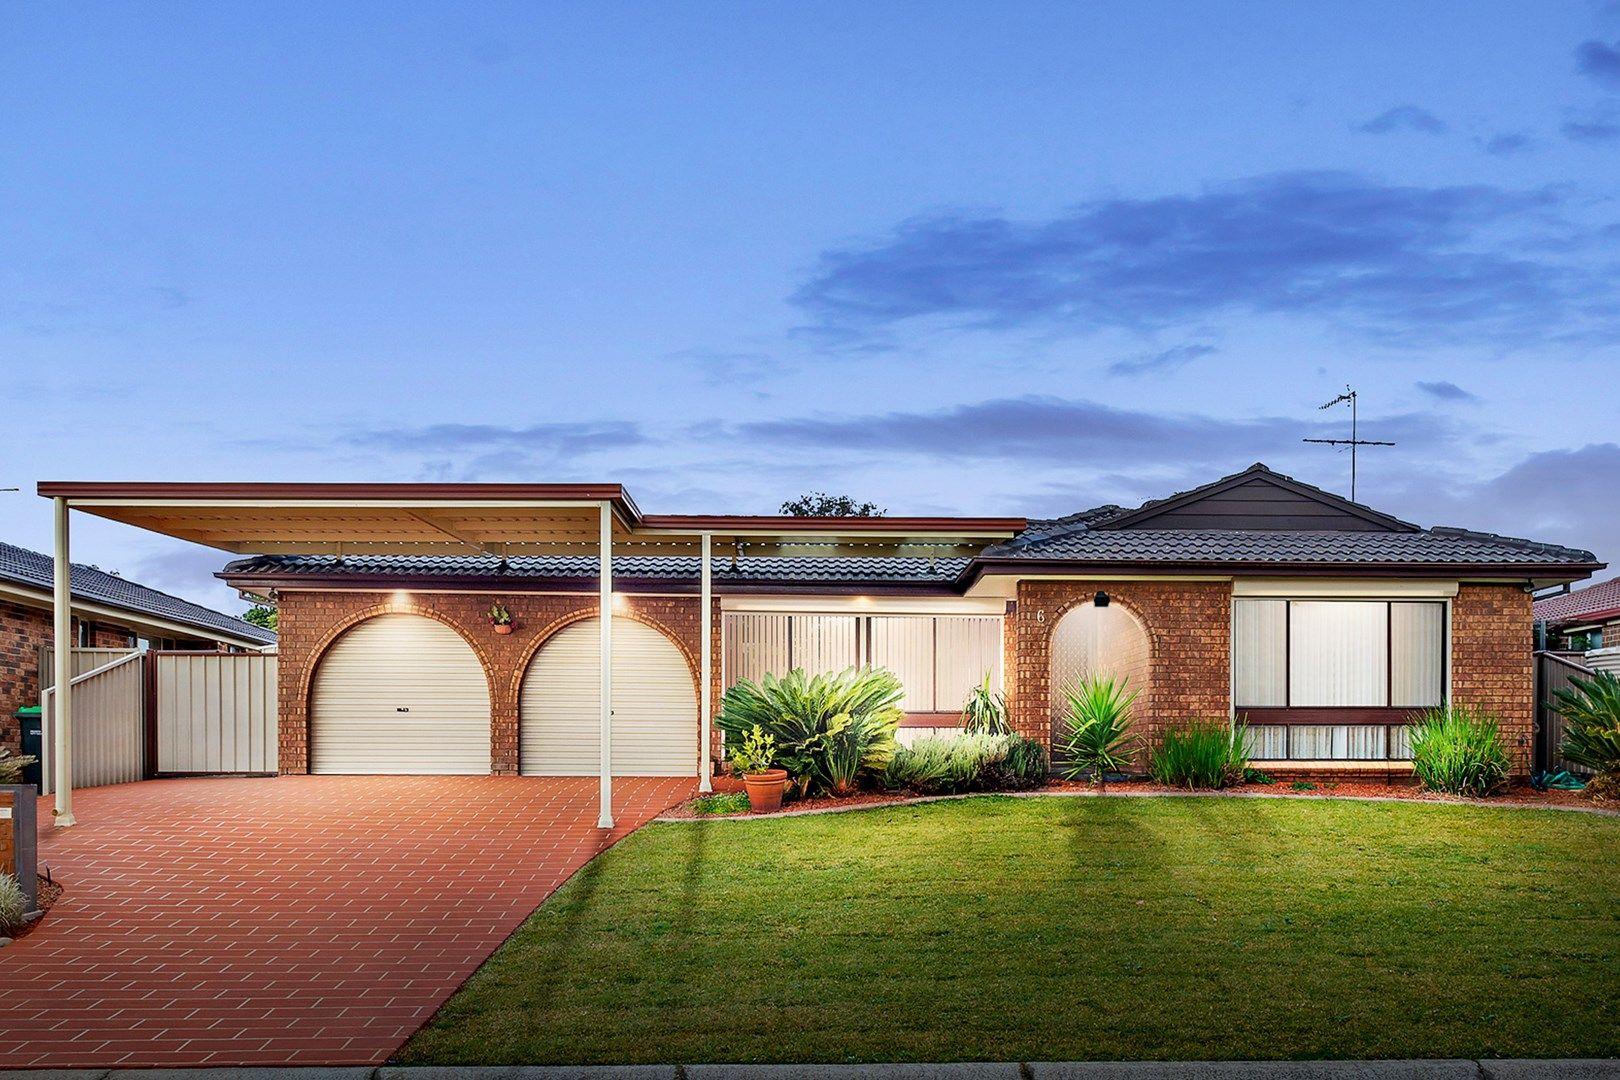 6 Kookaburra Place, Erskine Park NSW 2759, Image 0